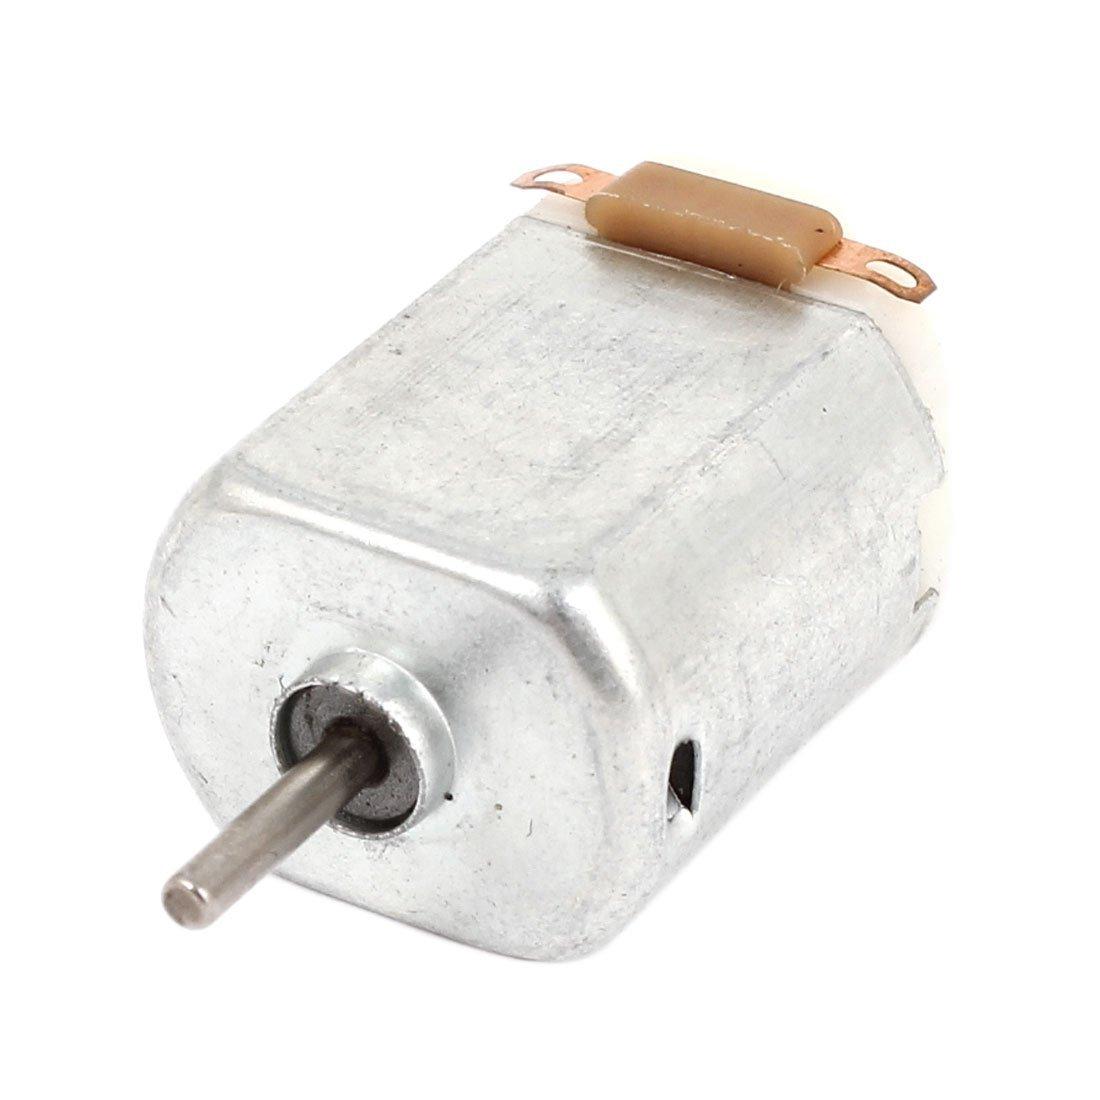 3v Mini Electric Motor 18000 Rpm Dc 1.5v Diy Toy Hobby Crazy Price